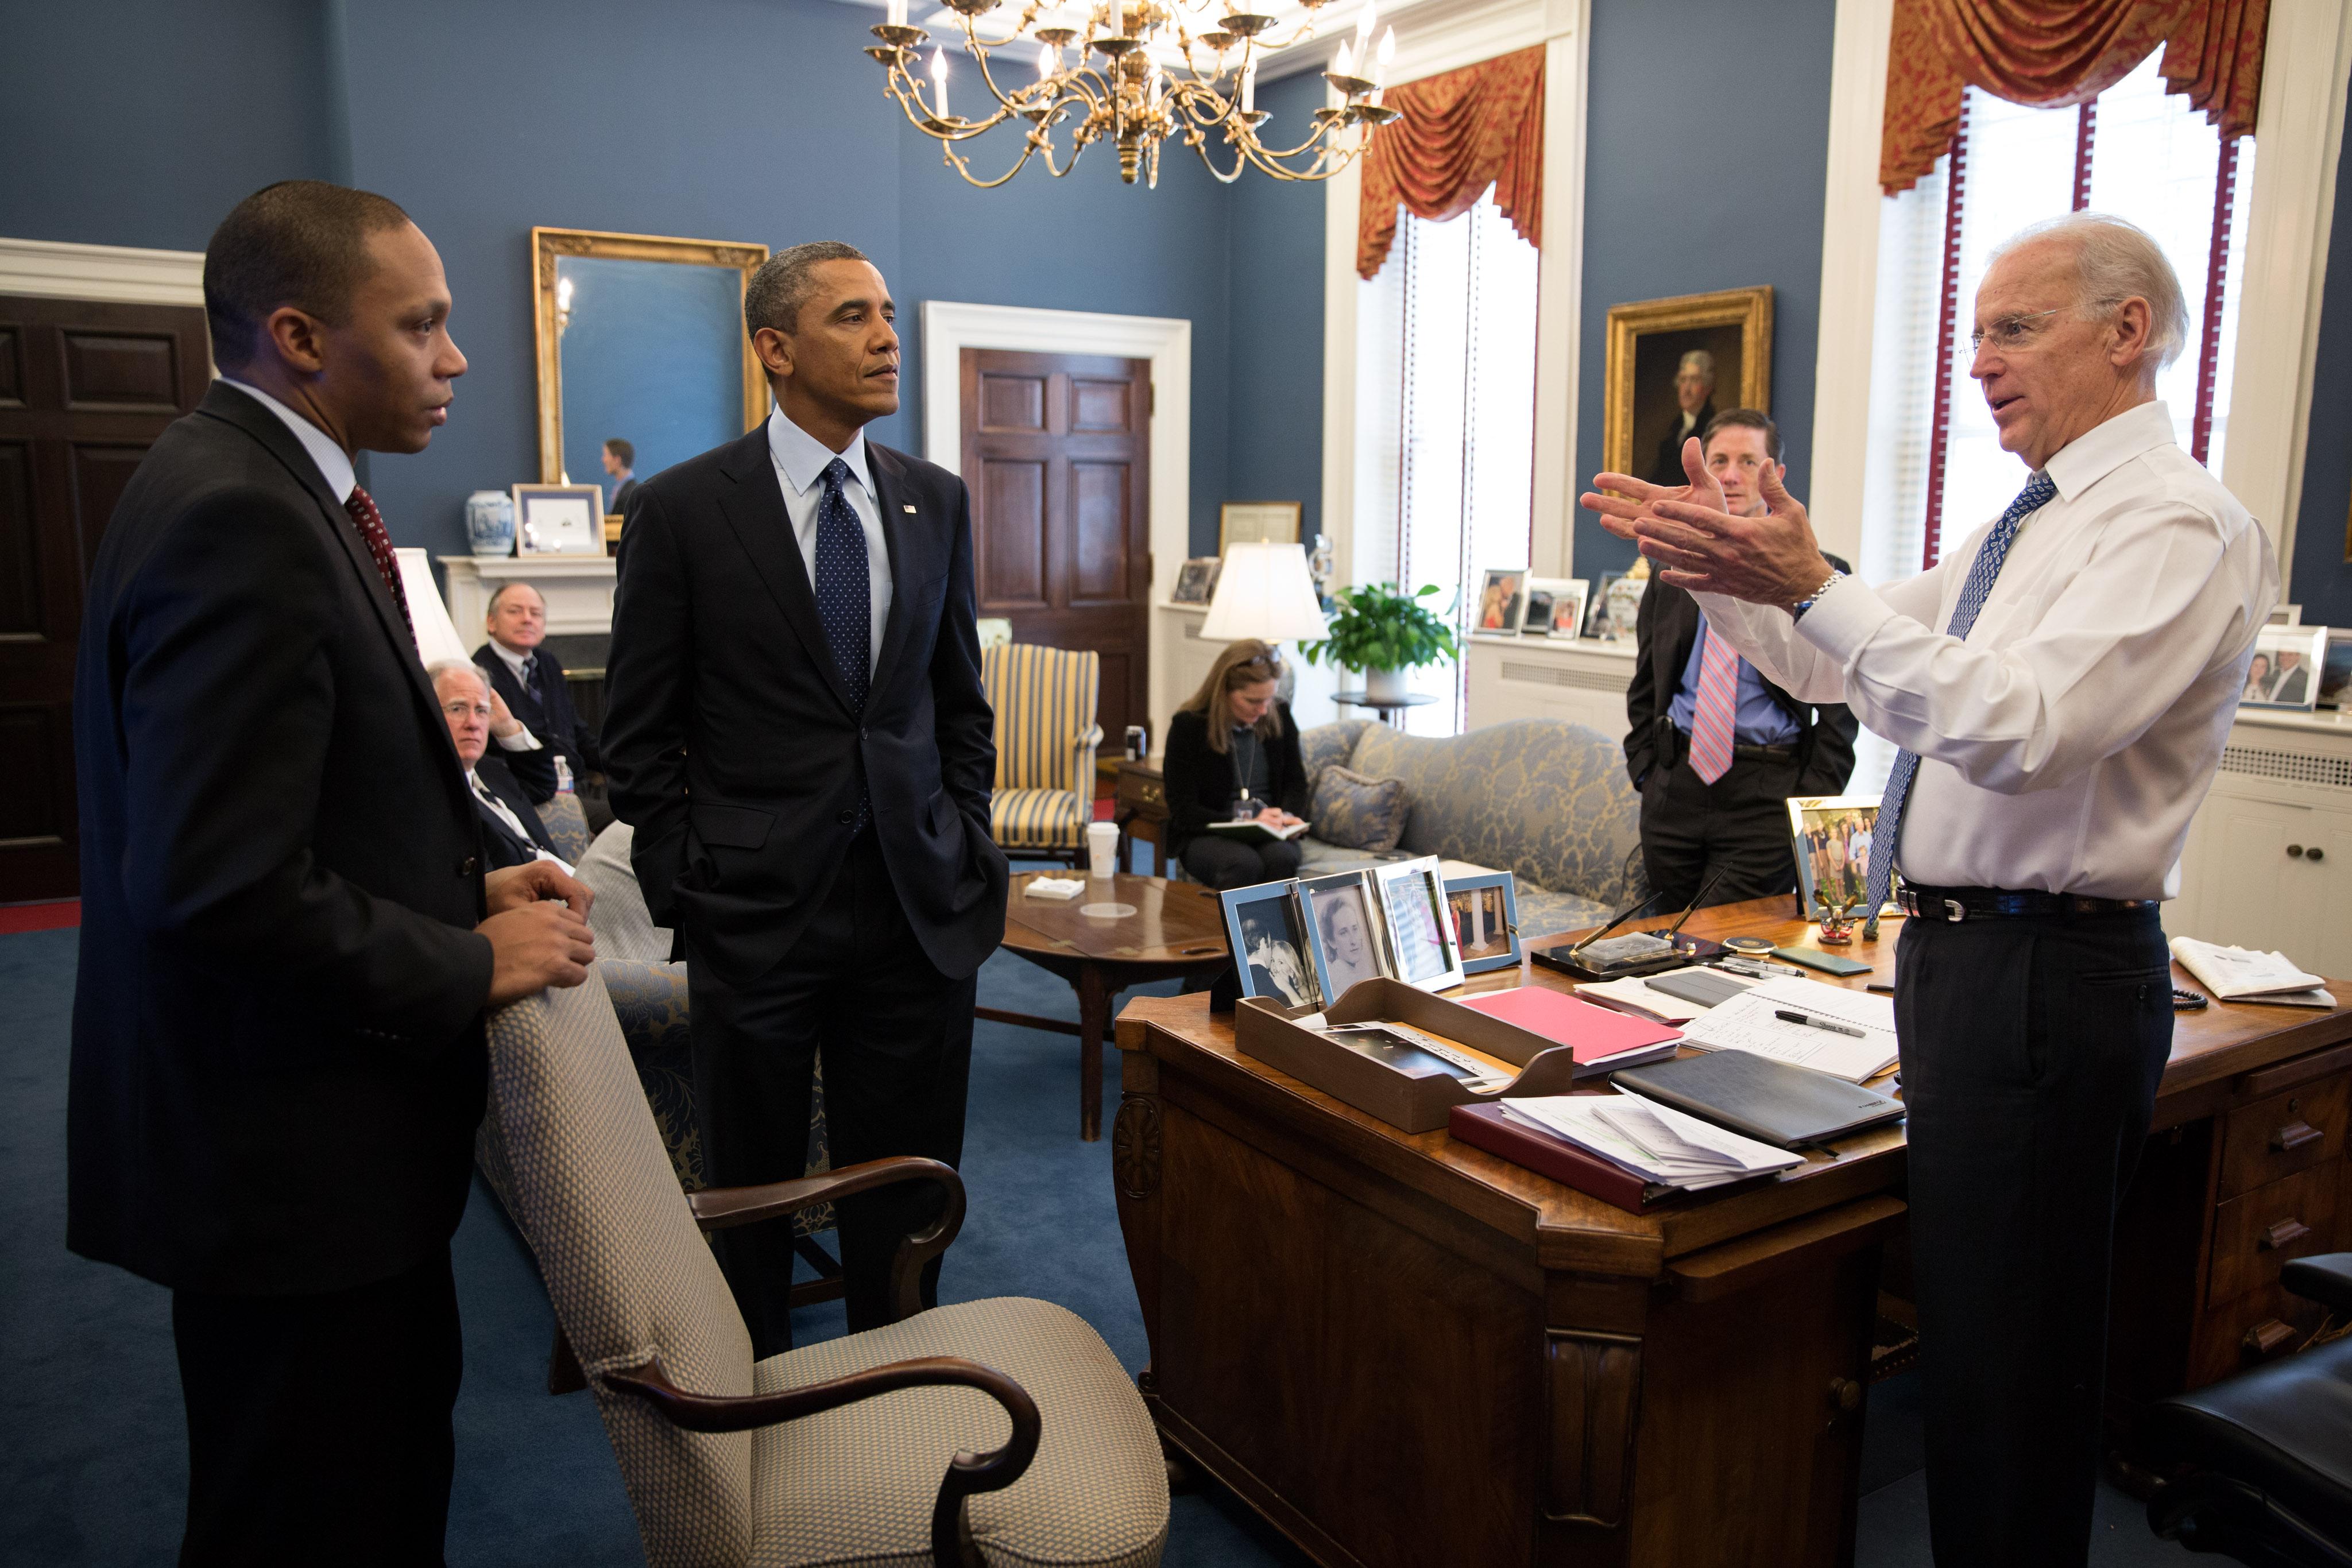 Oval Office Rug File Barack Obama And Joe Biden In The Vice President S